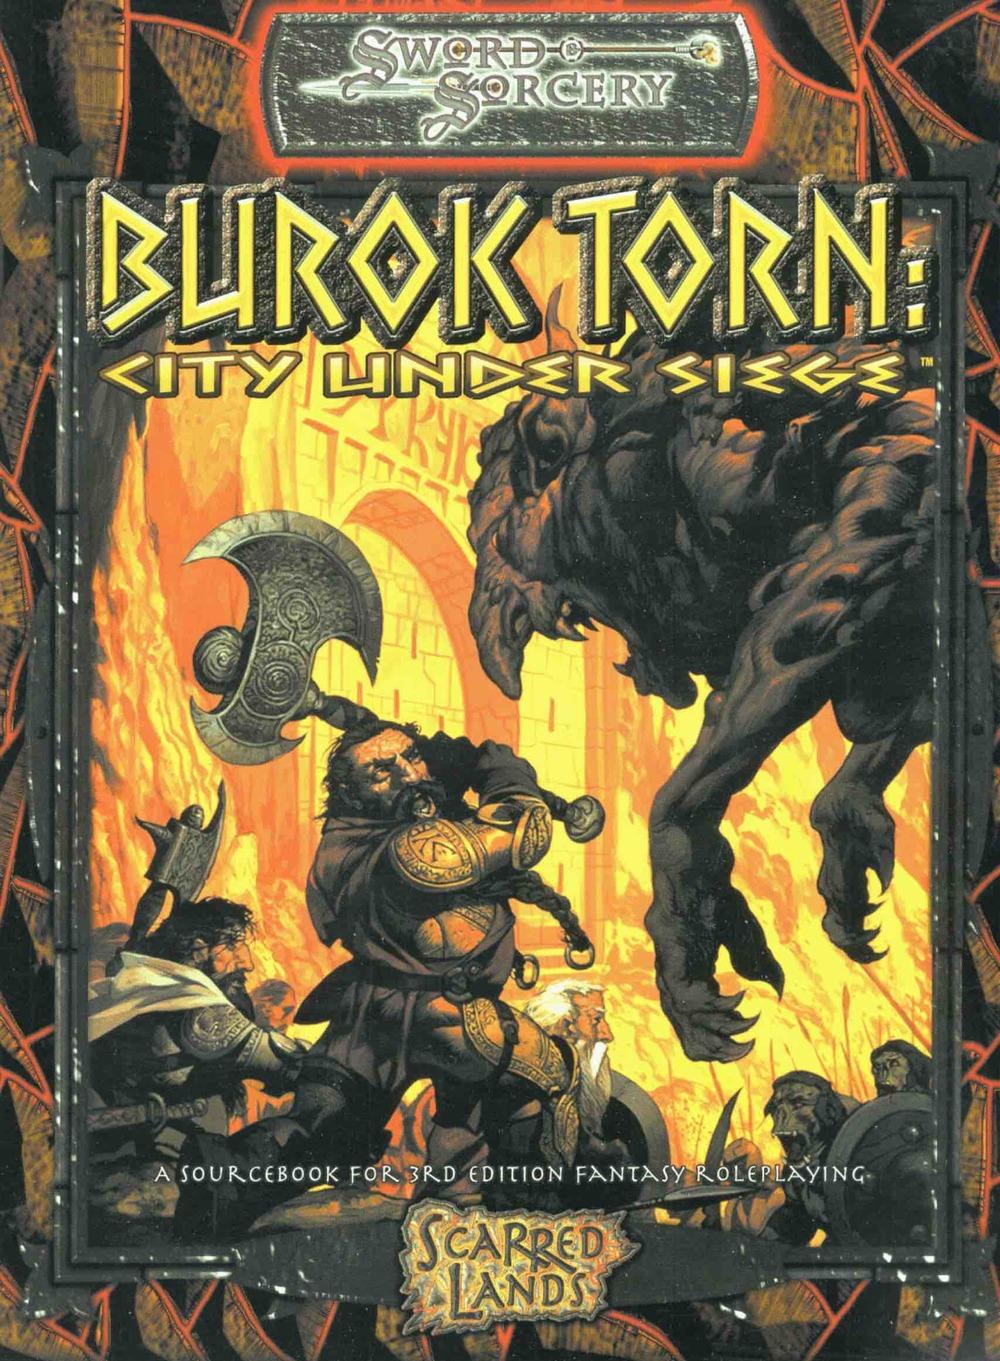 SL_BurokTorn.jpg